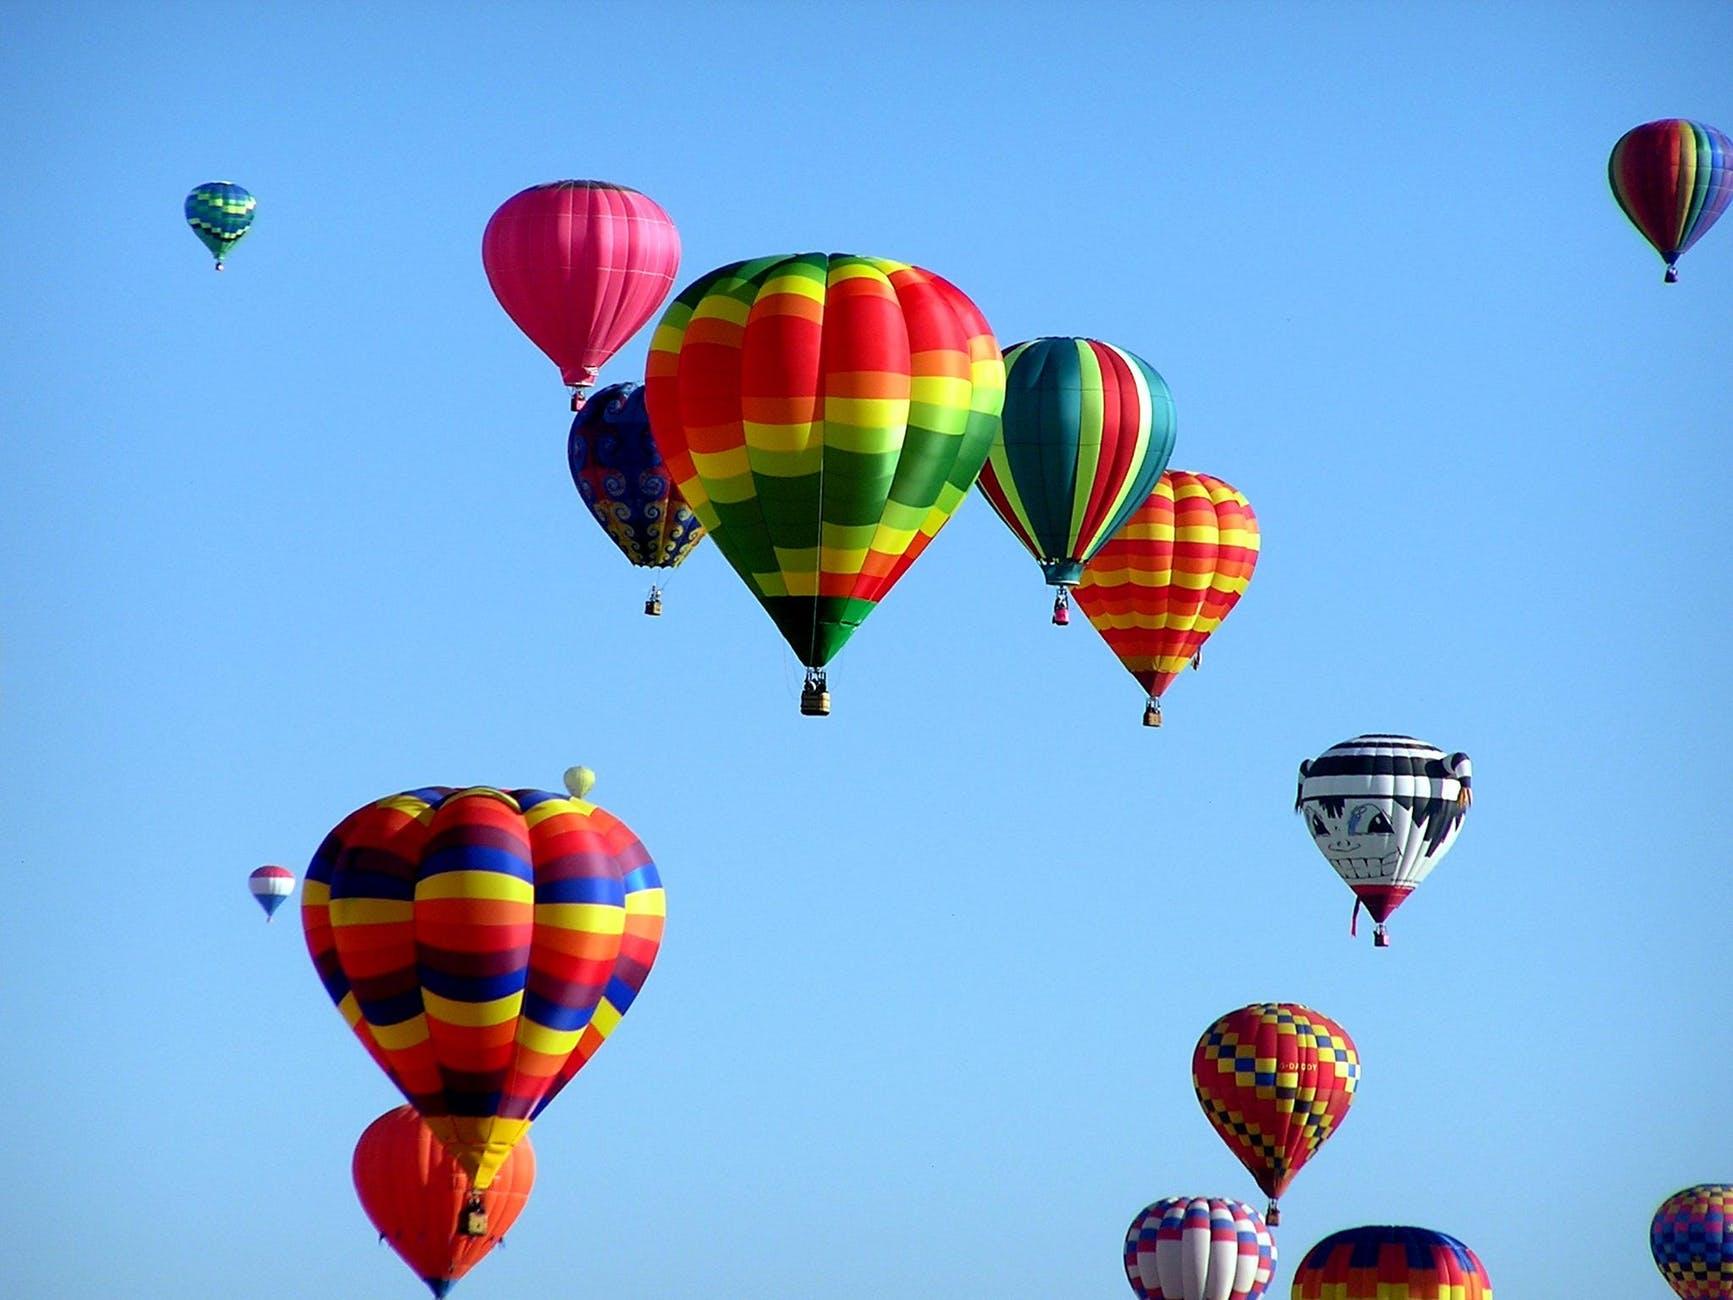 hot-air-balloons-hot-air-ballooning-event-51377.jpeg